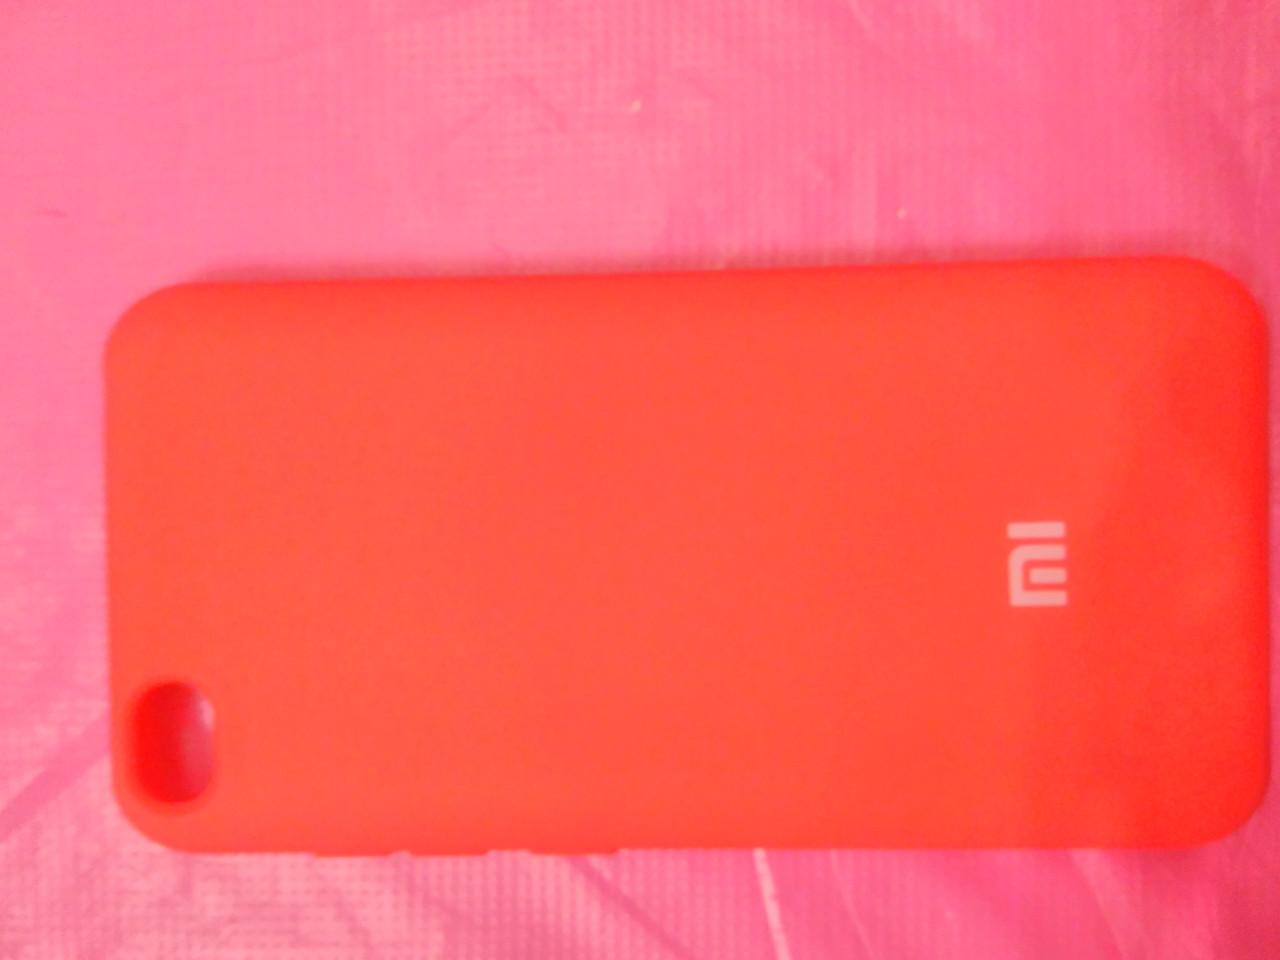 Накладка   Silicon Cover full   для  Xiaomi Redmi GO (красный)